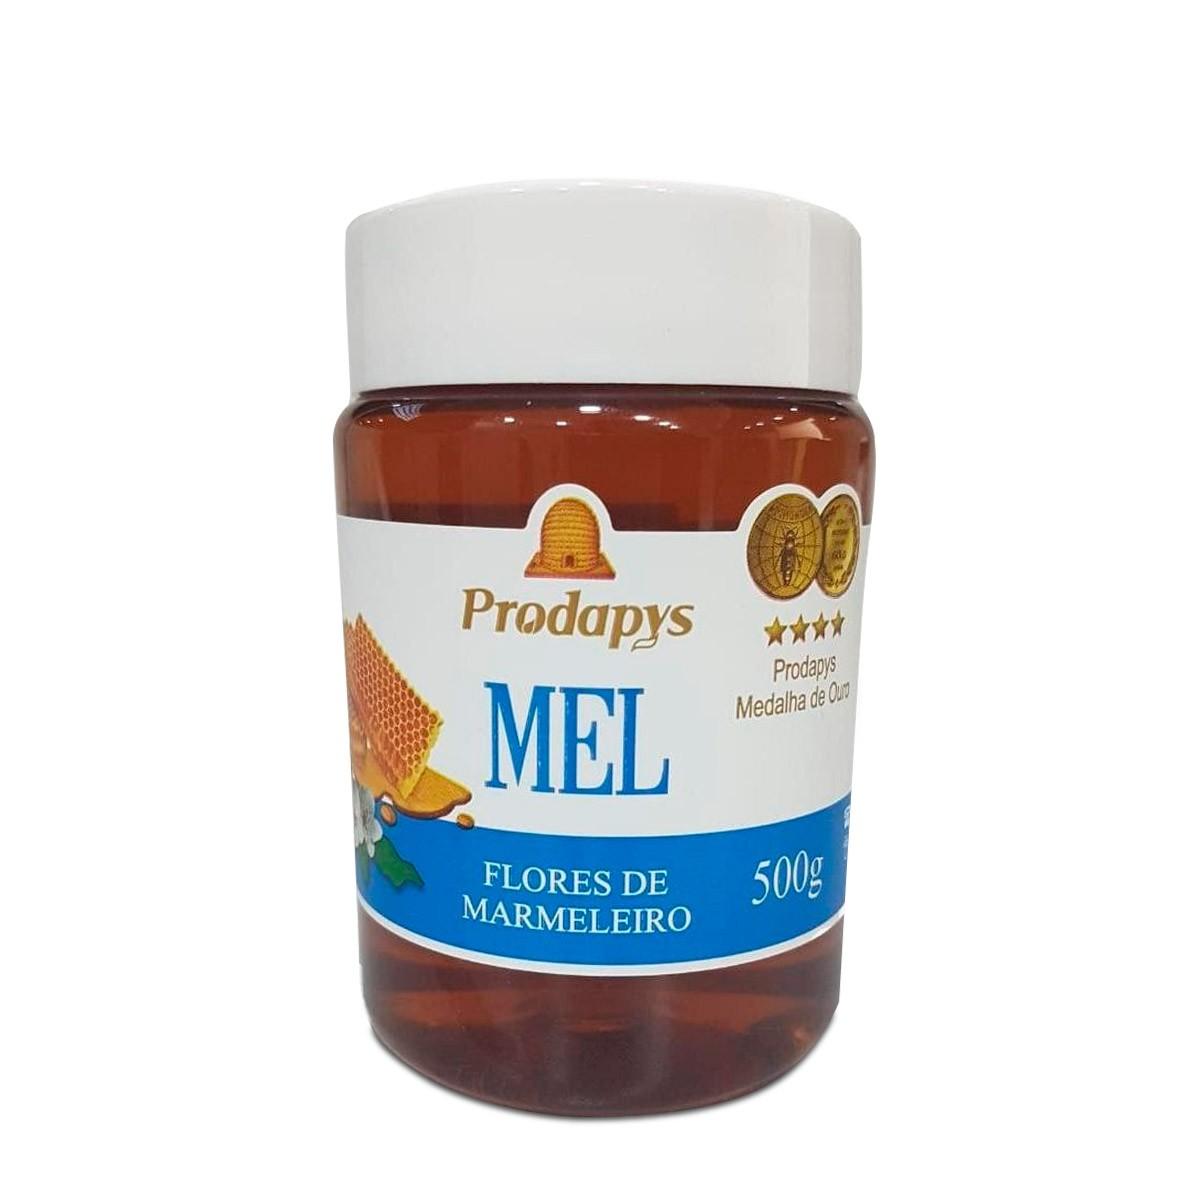 Mel Flor de Marmeleiro Prodapys 500g